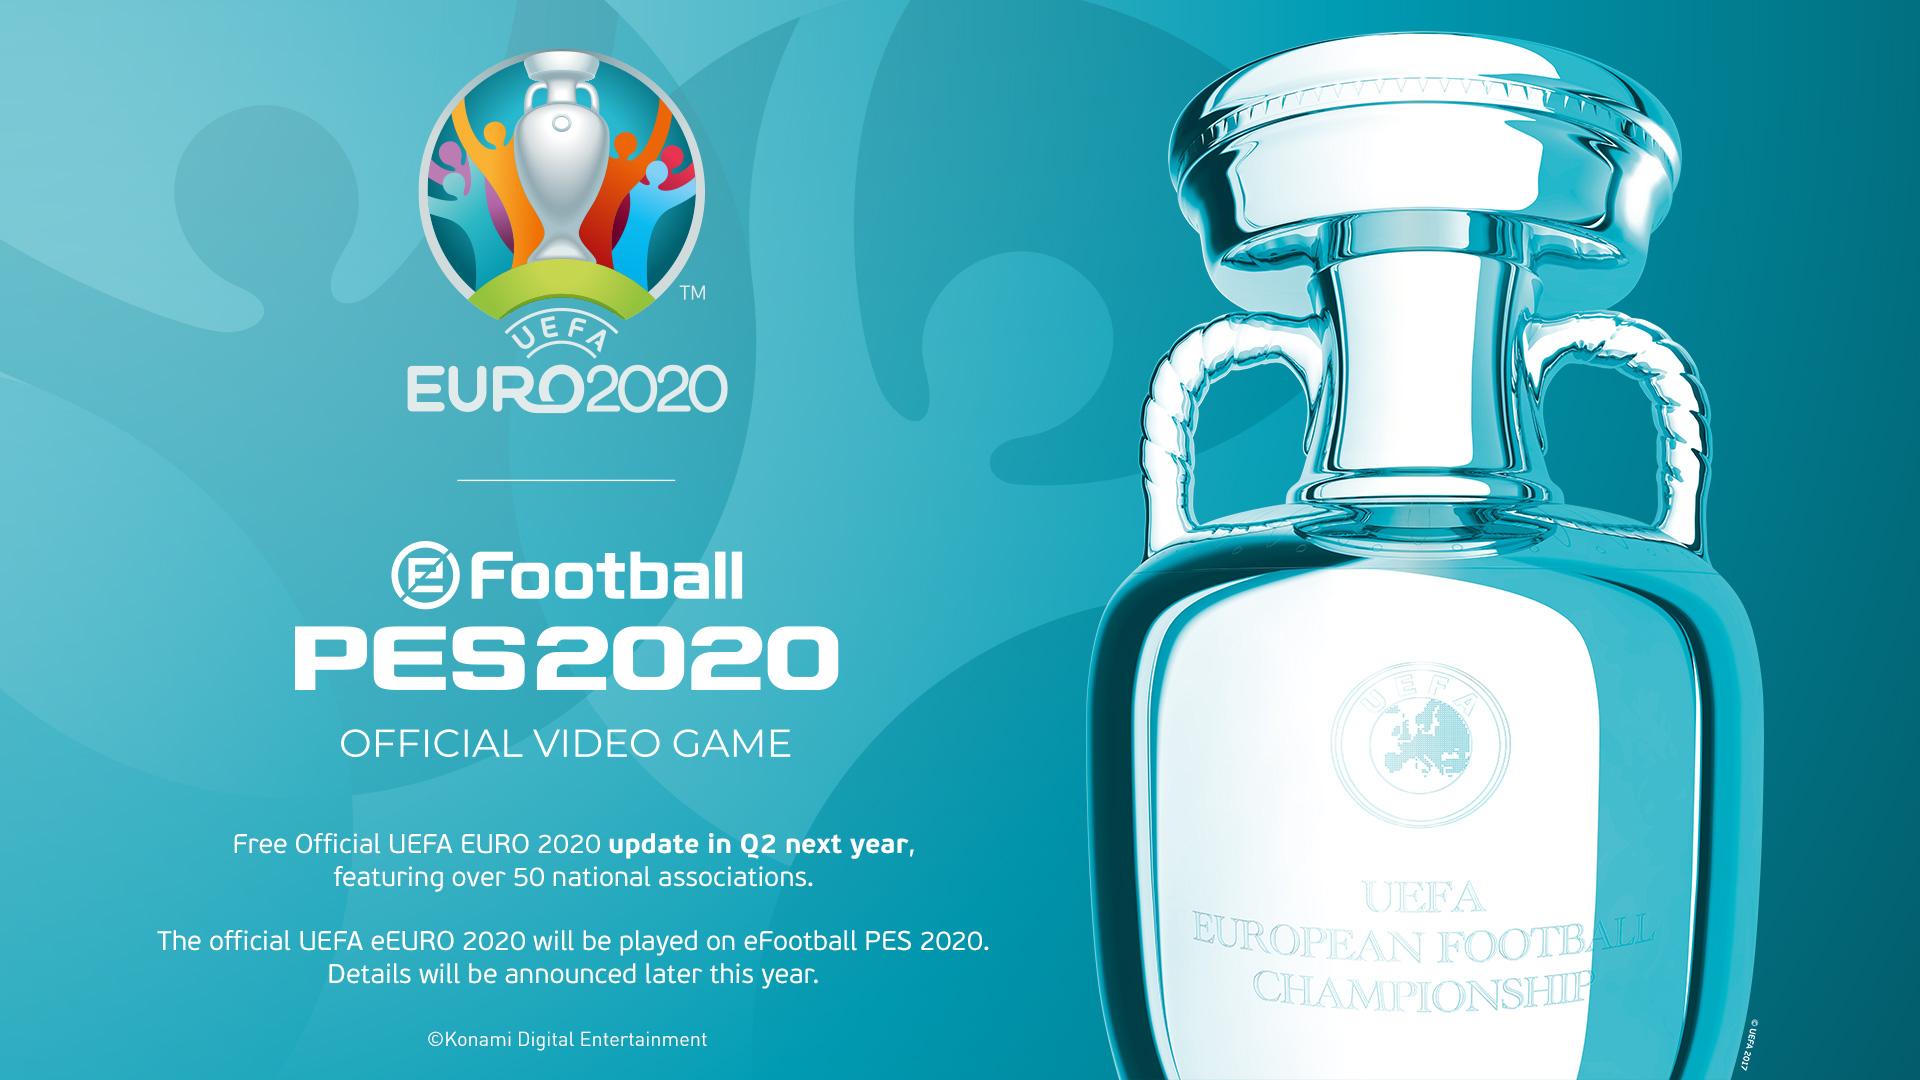 UEFA EURO 2020 eFootball PES 2020